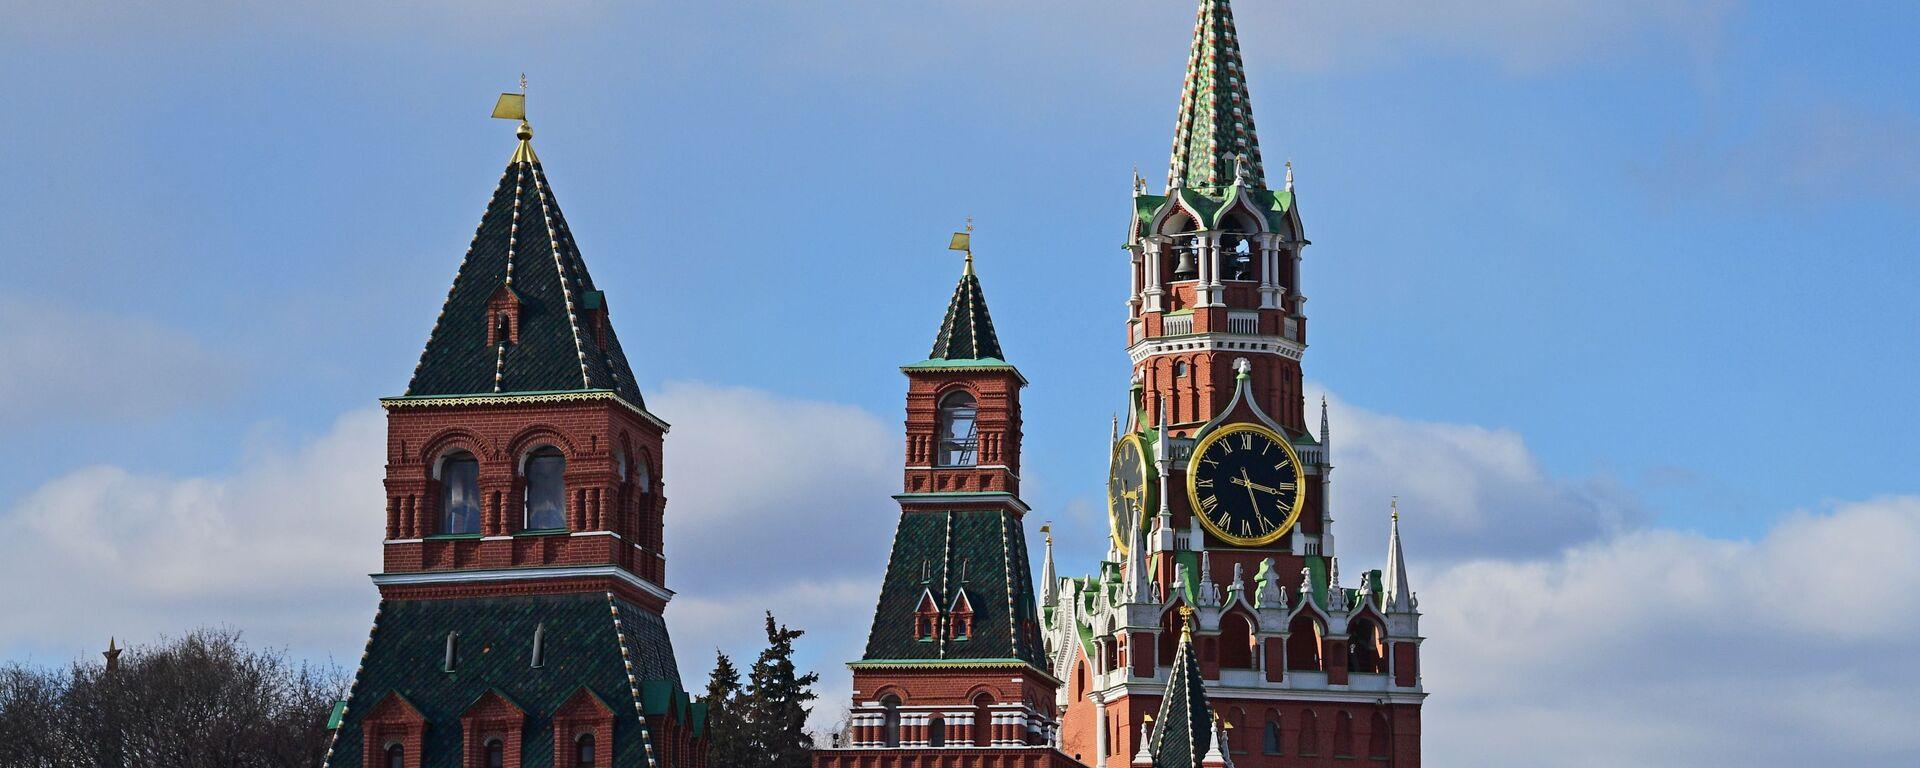 El Kremlin de Moscú - Sputnik Mundo, 1920, 09.02.2021